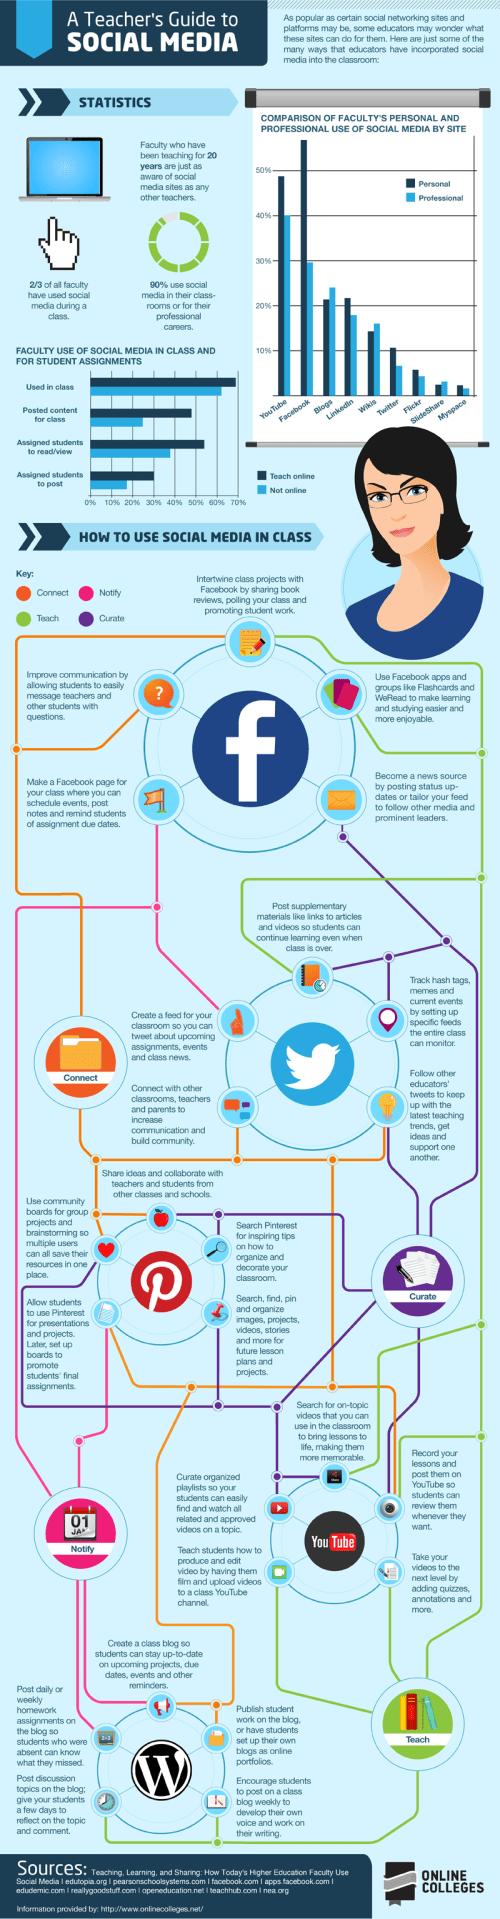 A Teacher's Guide to Social Media